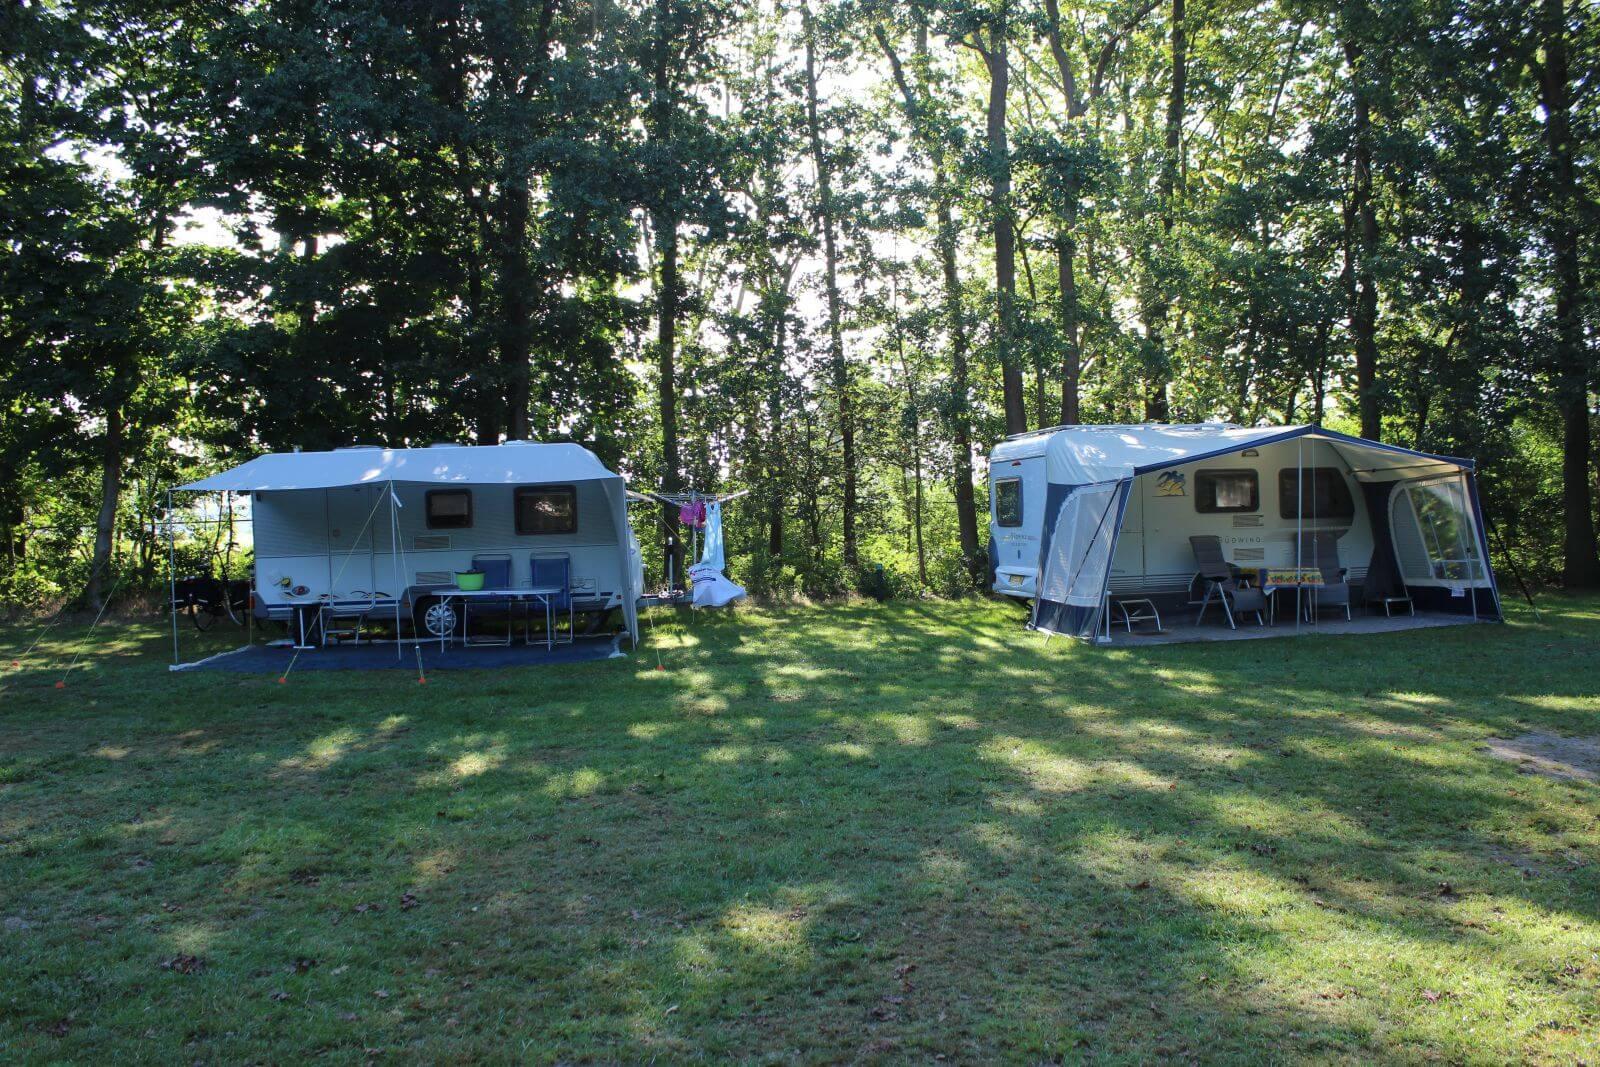 Toeristisch kamperen